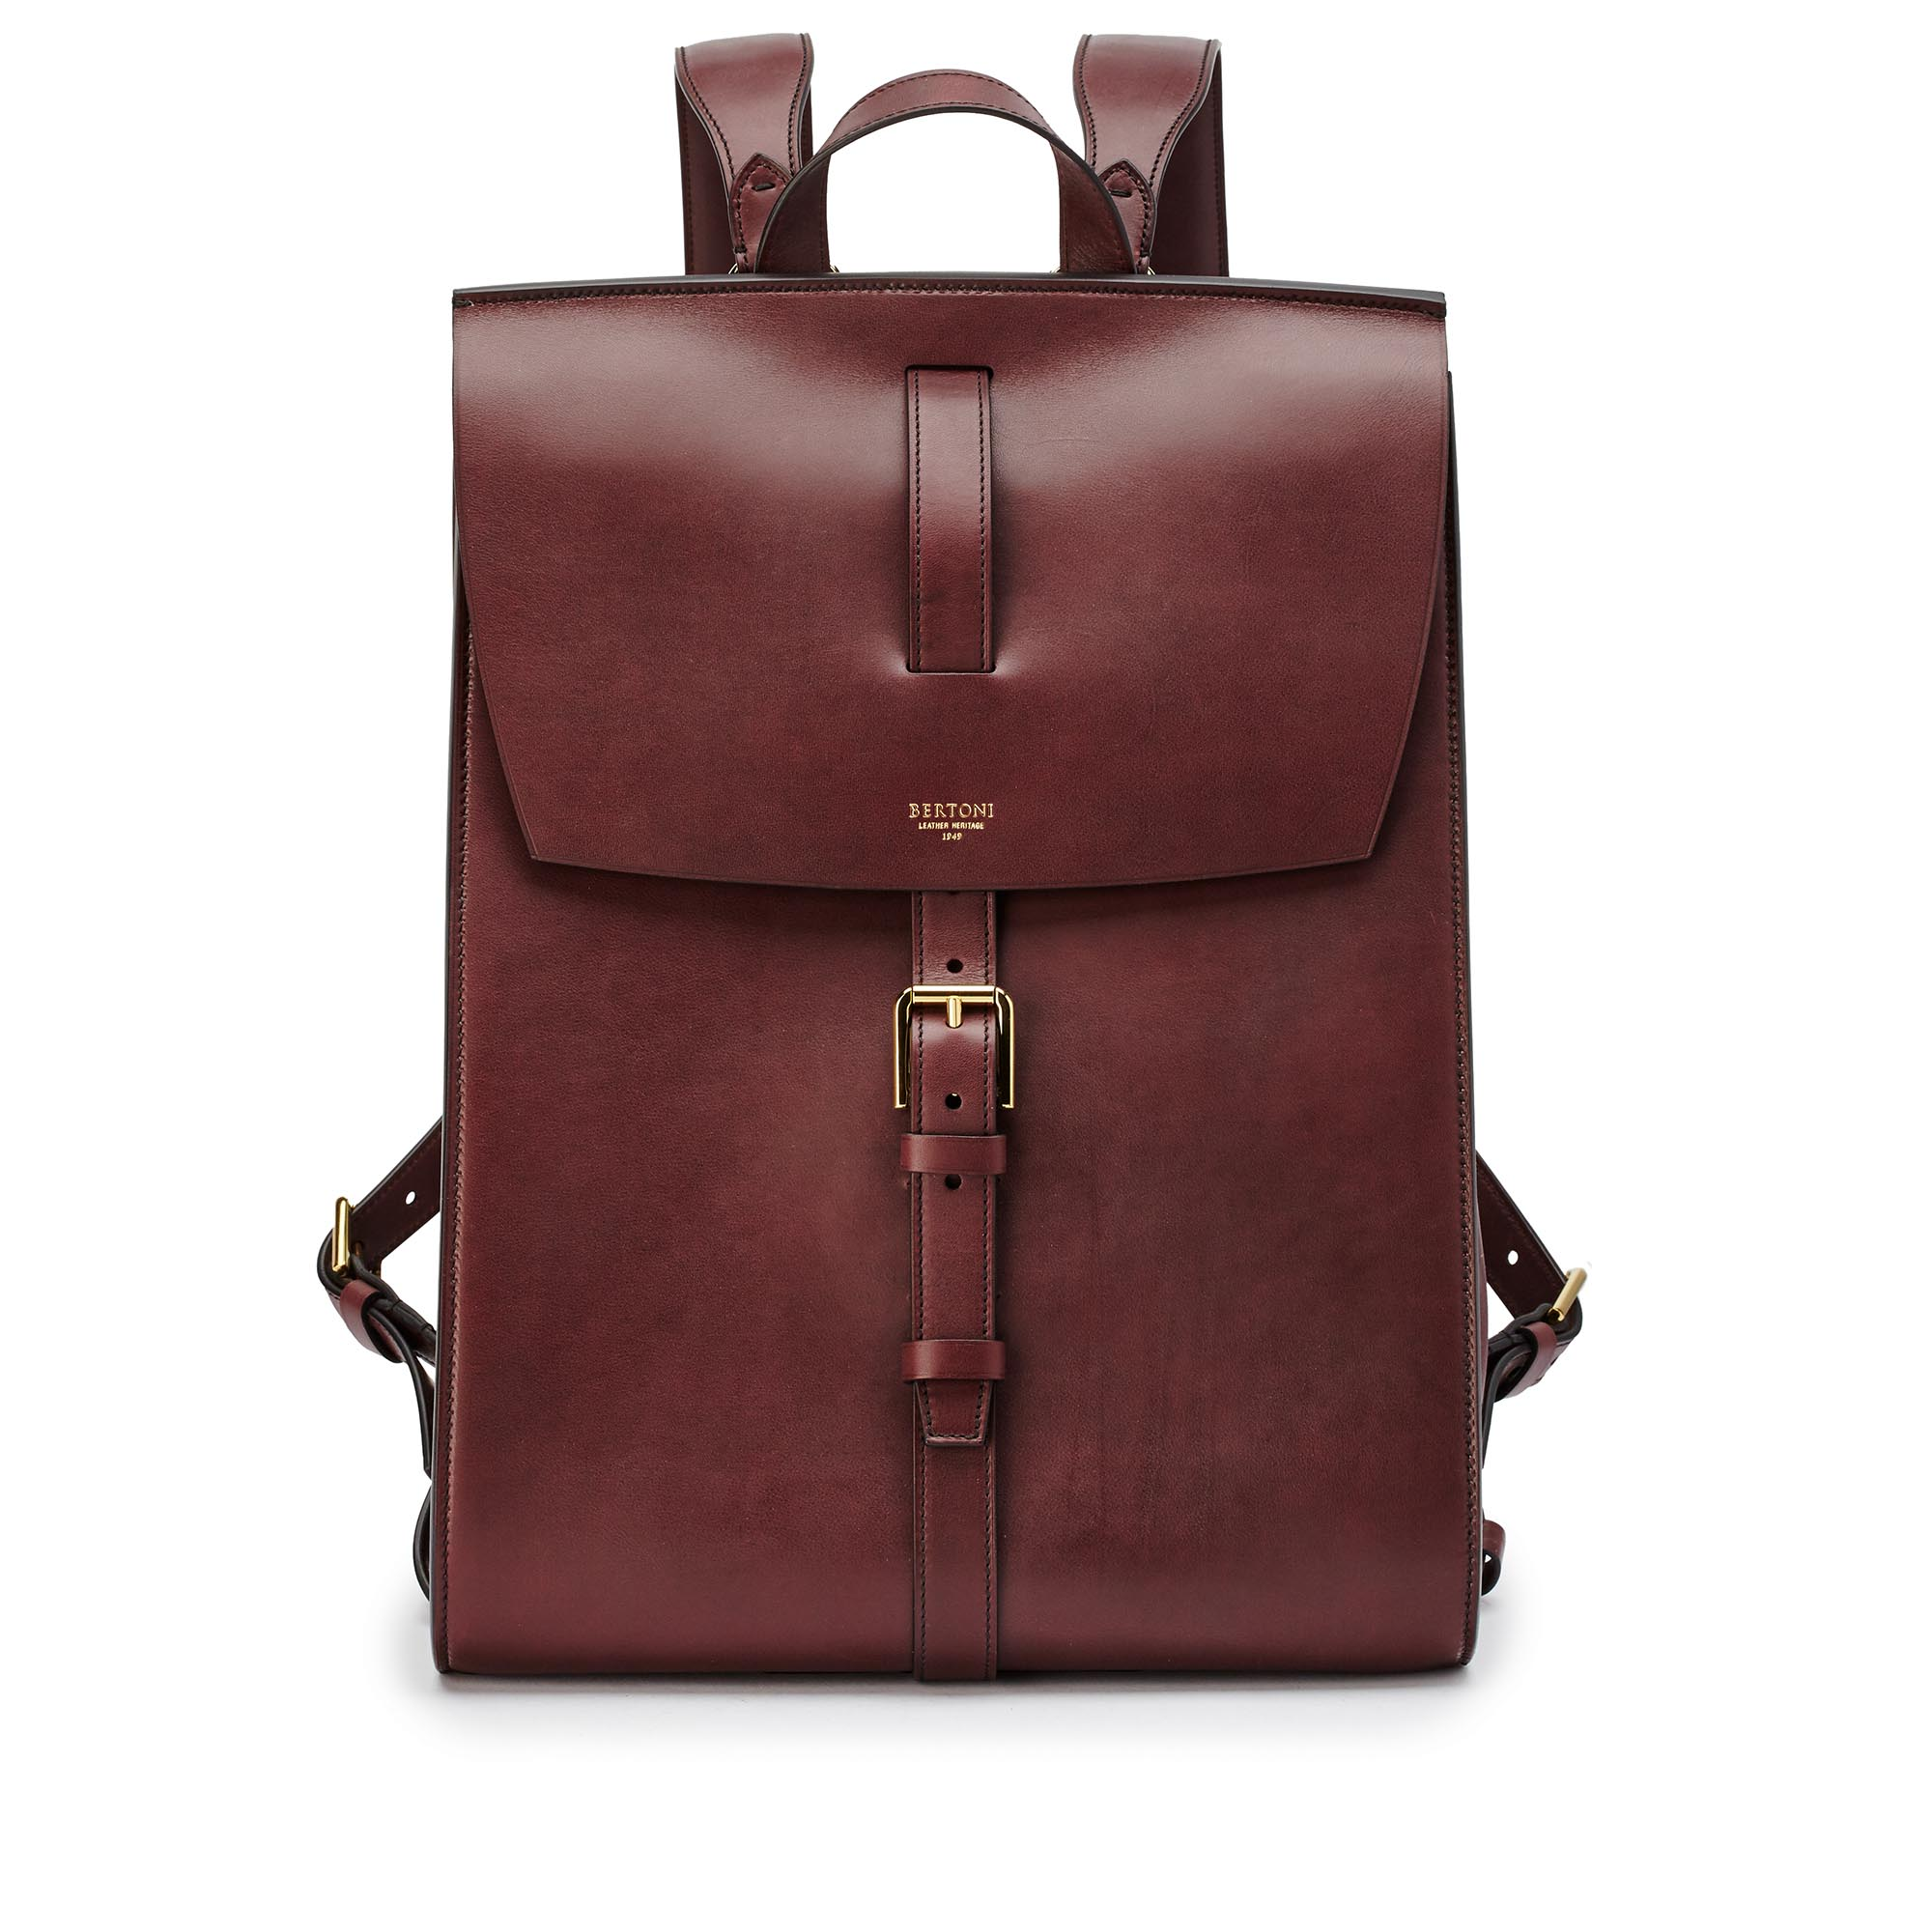 Signature-Backpack-bordeaux-french-calf-bag-Bertoni-1949